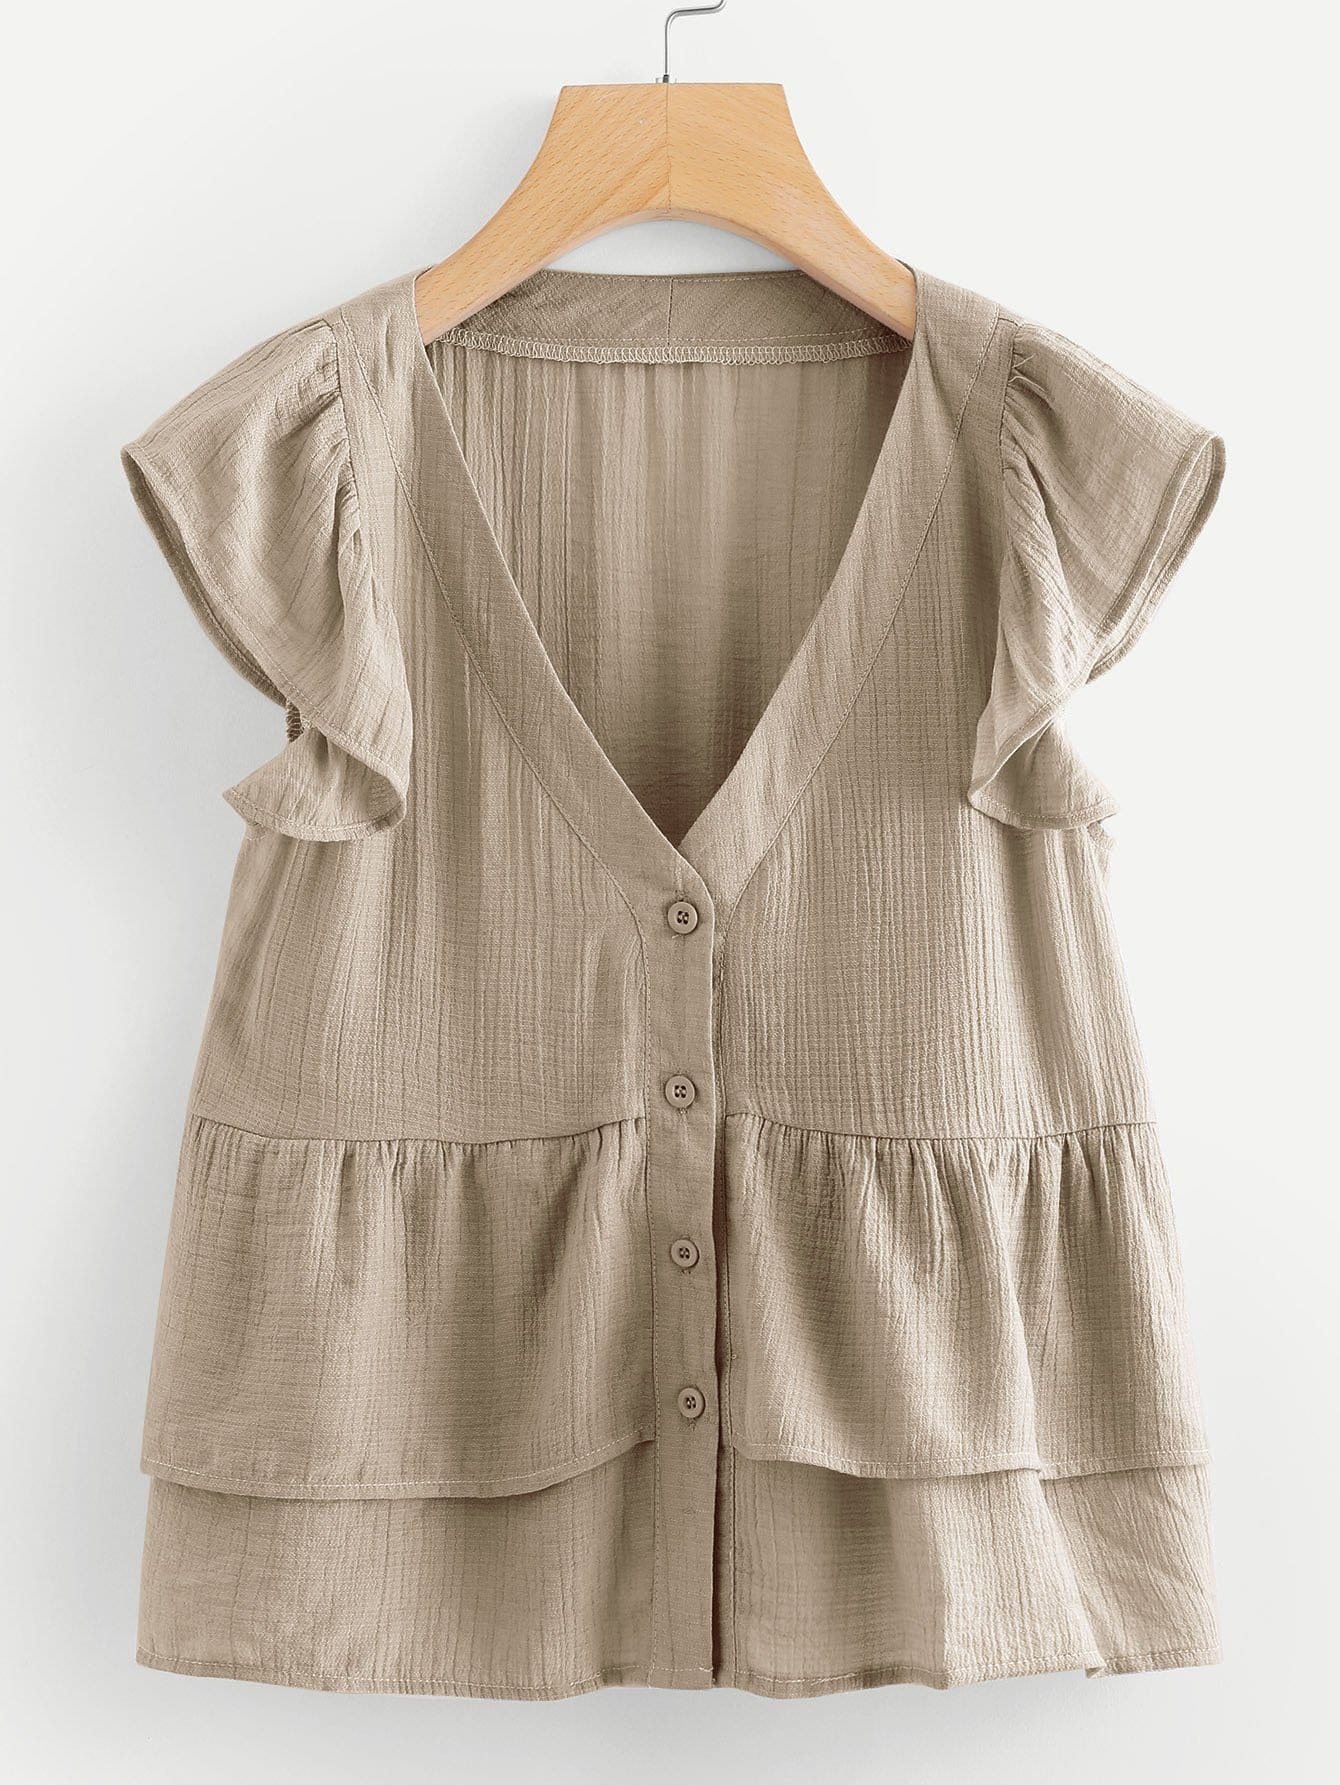 Ruffle Trim Blouse ruffle trim blouse